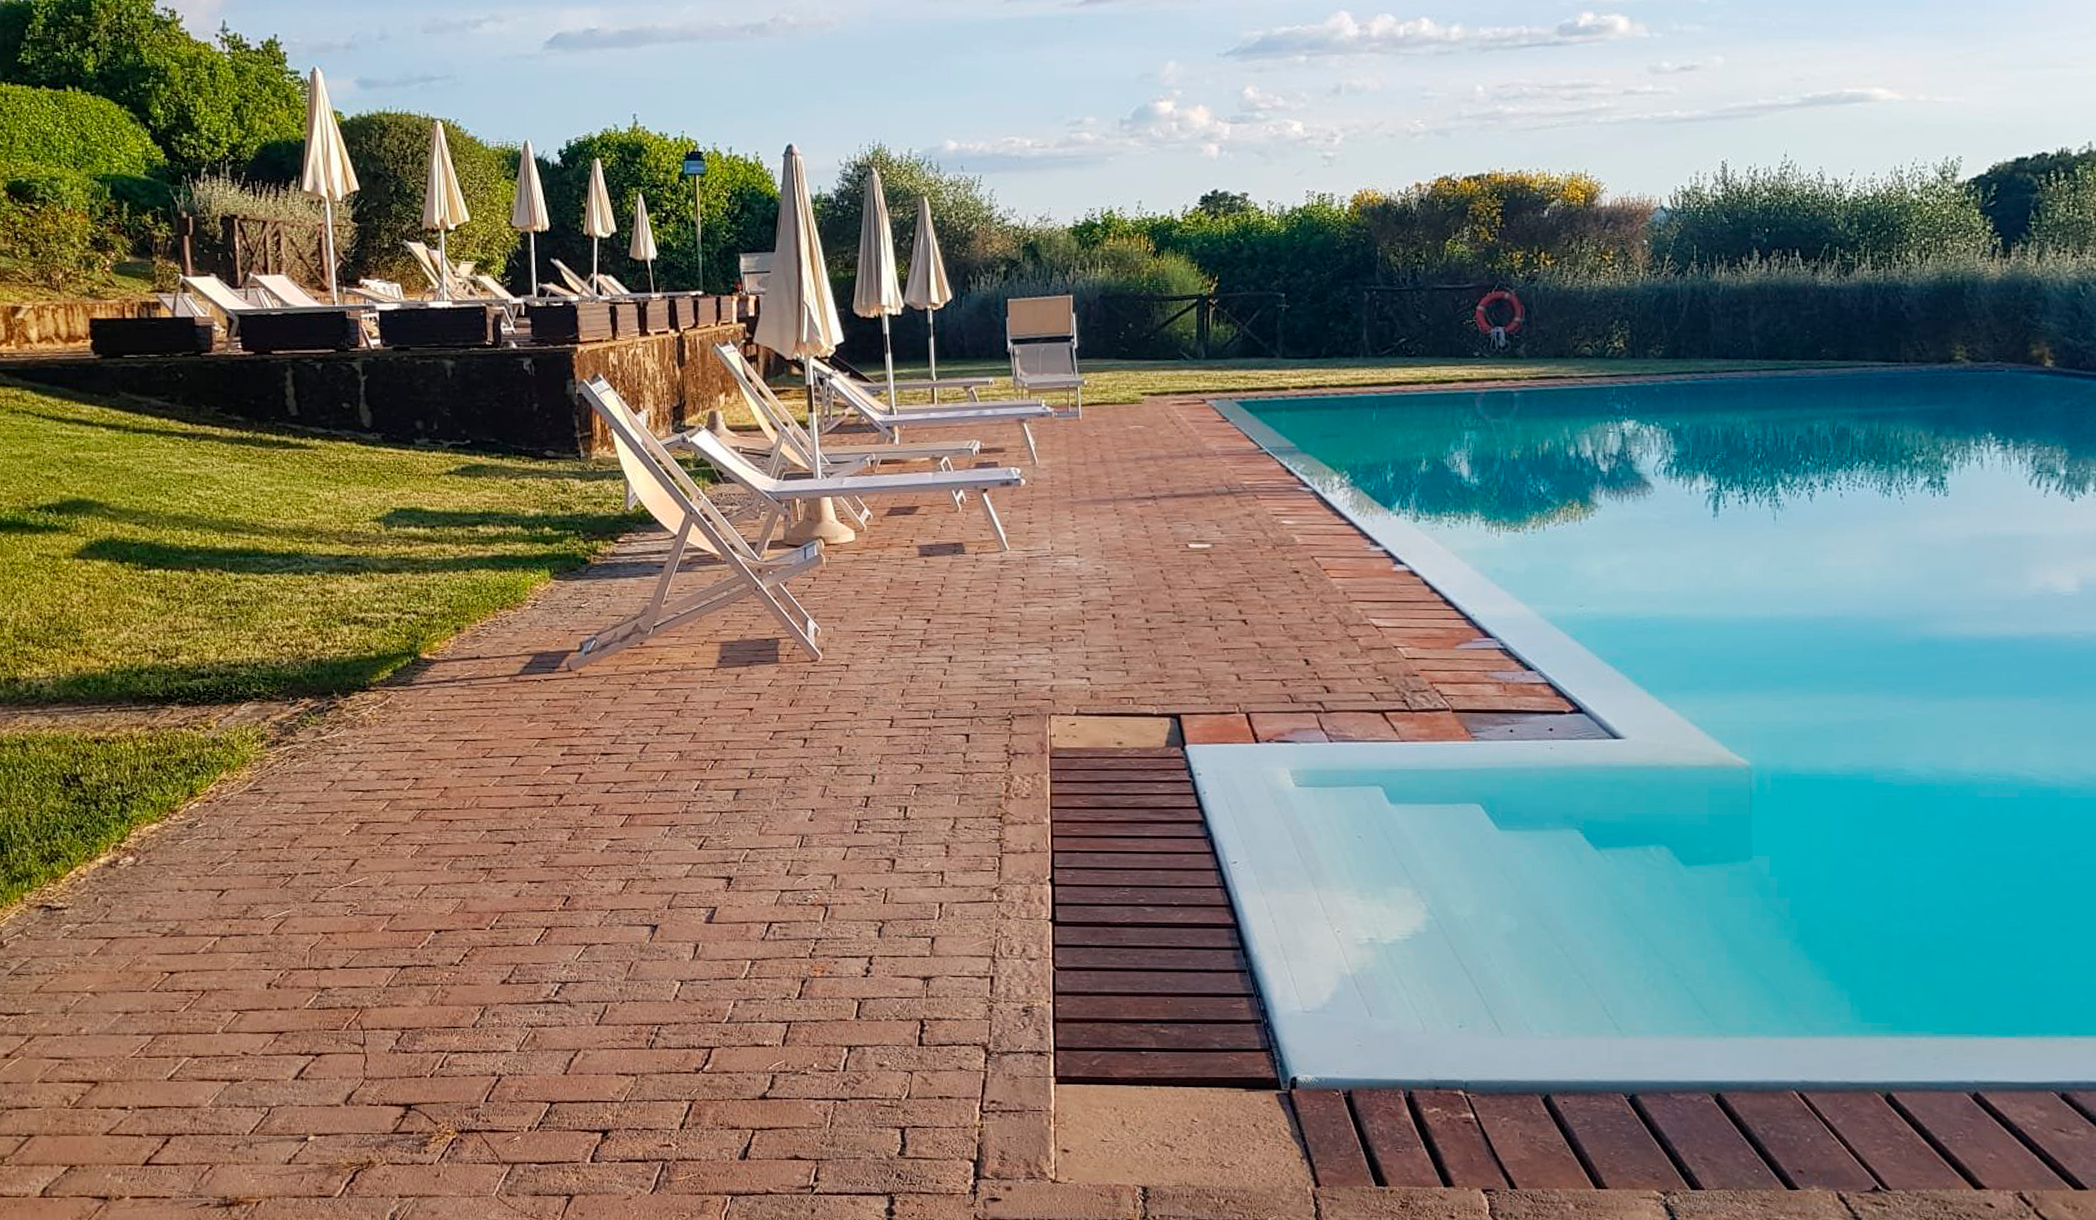 Pulizia piscine a Poggibonsi